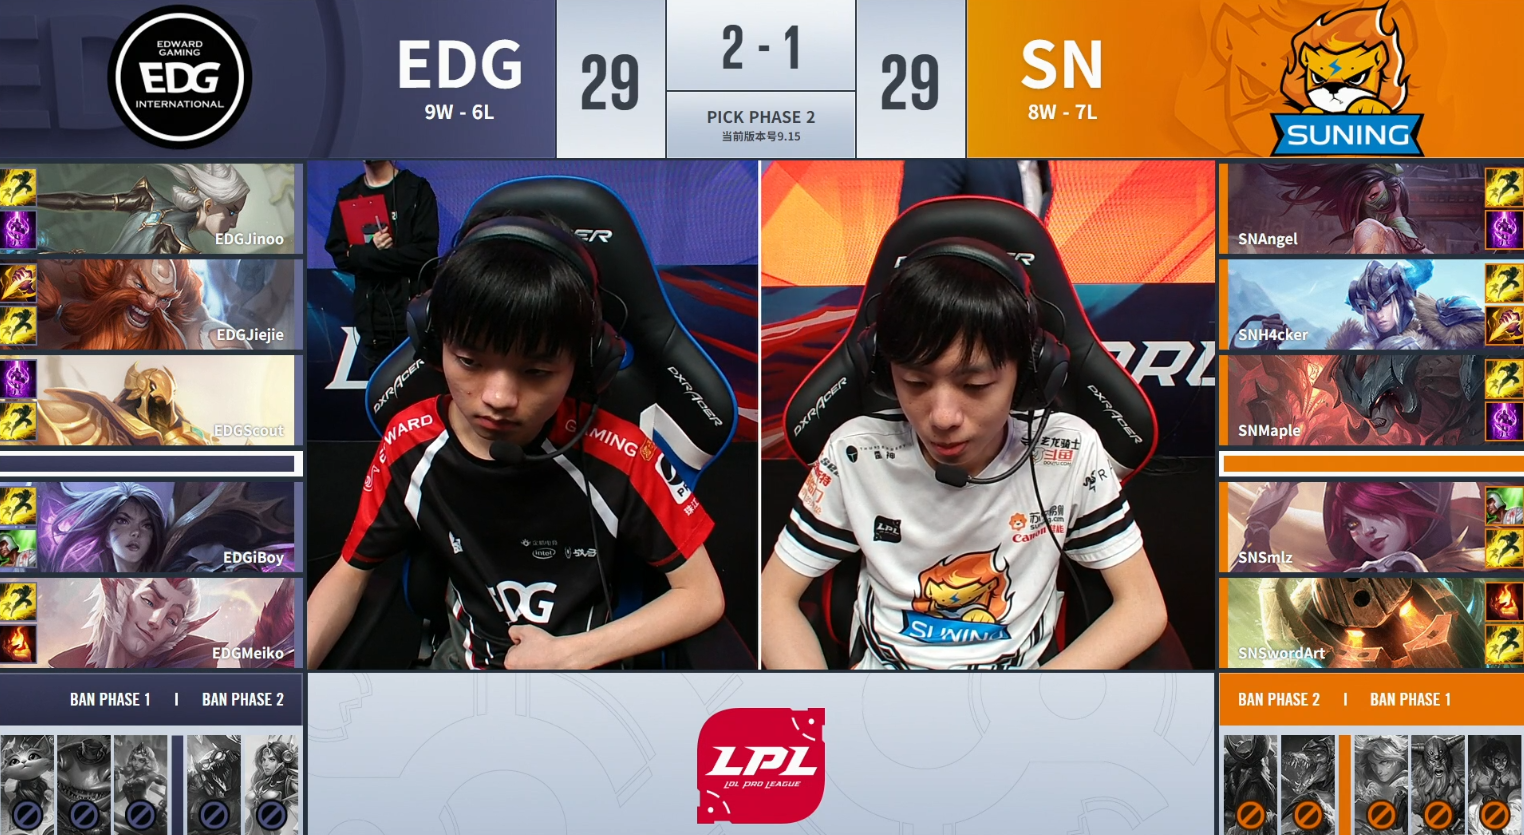 LOL:季后赛首战EDG完成让一追三,SN的BP被摸透了!